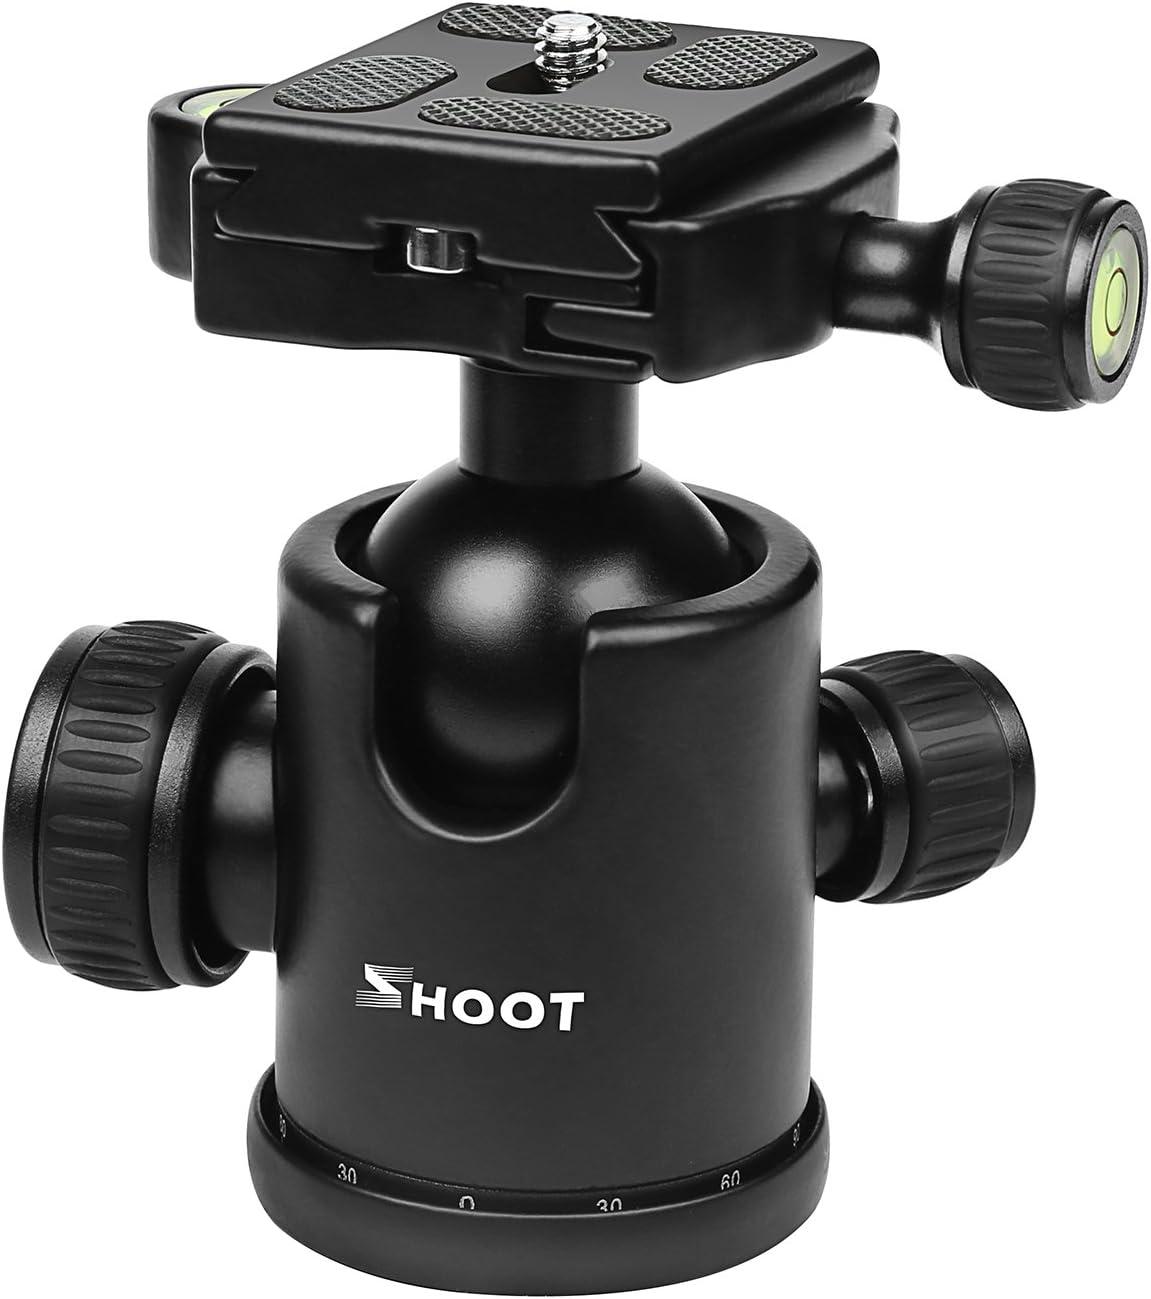 360° Pan Ball Head Rotating Panoramic 5-10kg Load For Camera Tripod Monopod UK